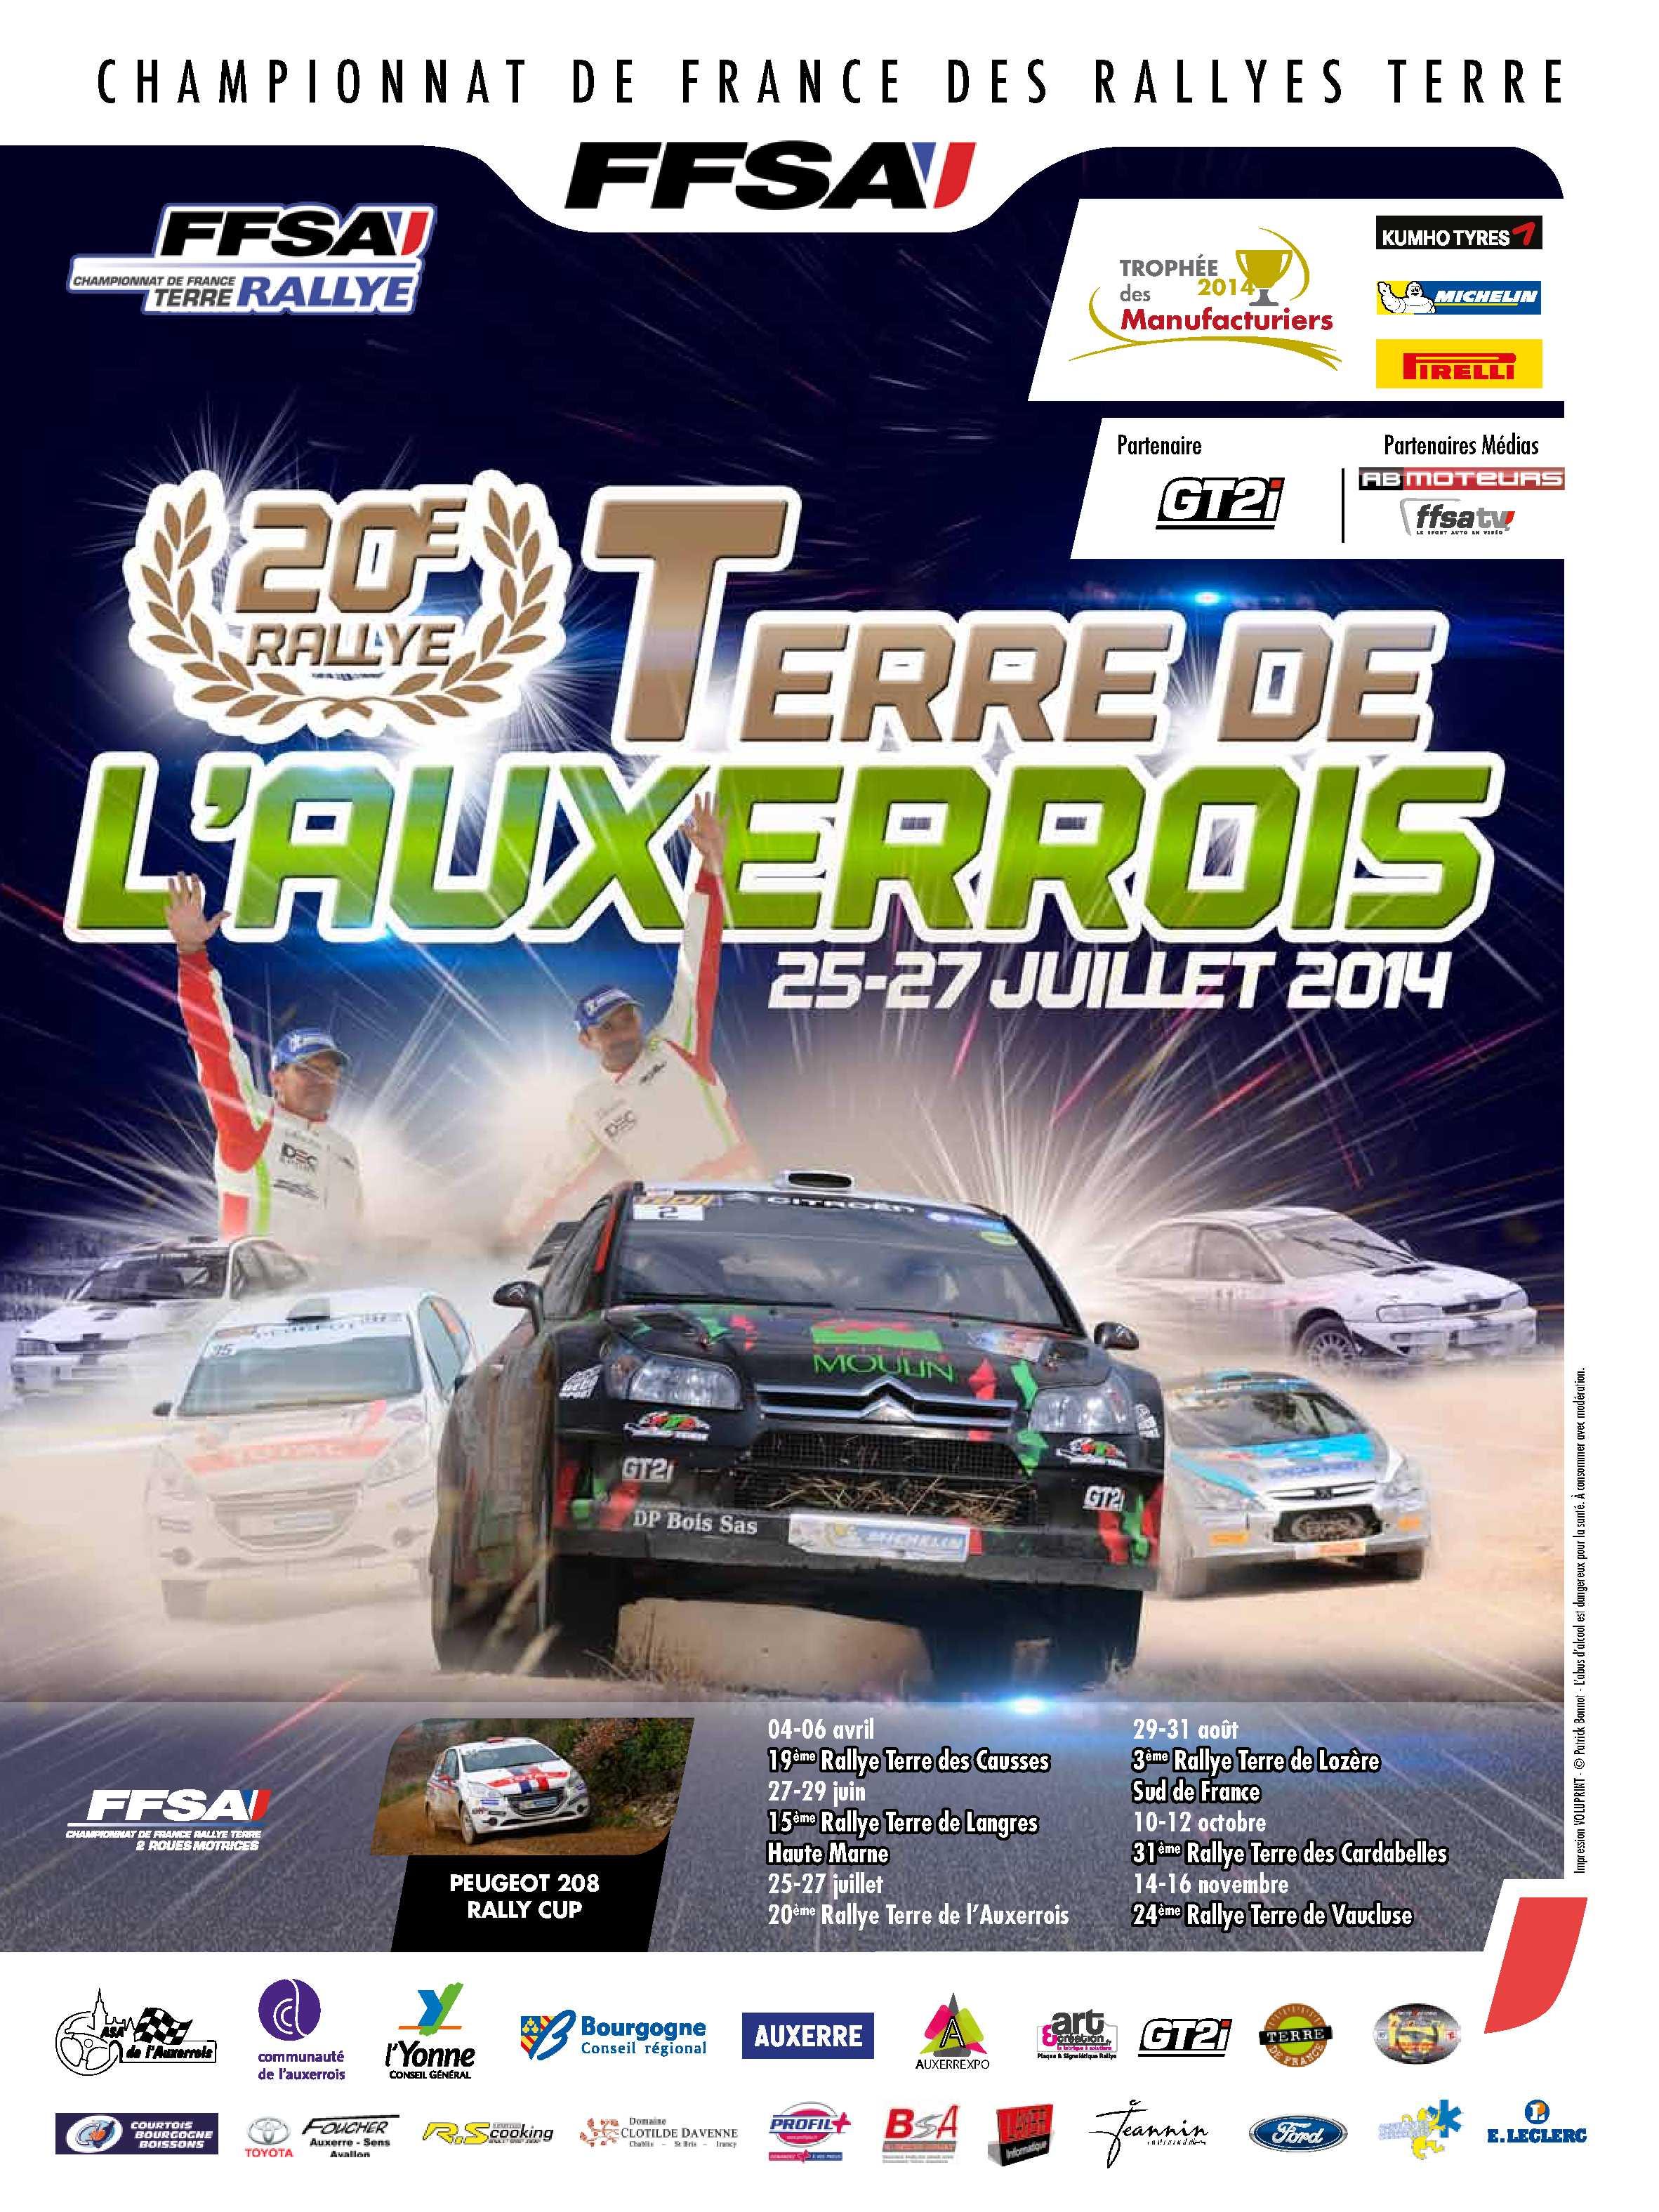 Rallye Terre de l'Auxerrois 2014